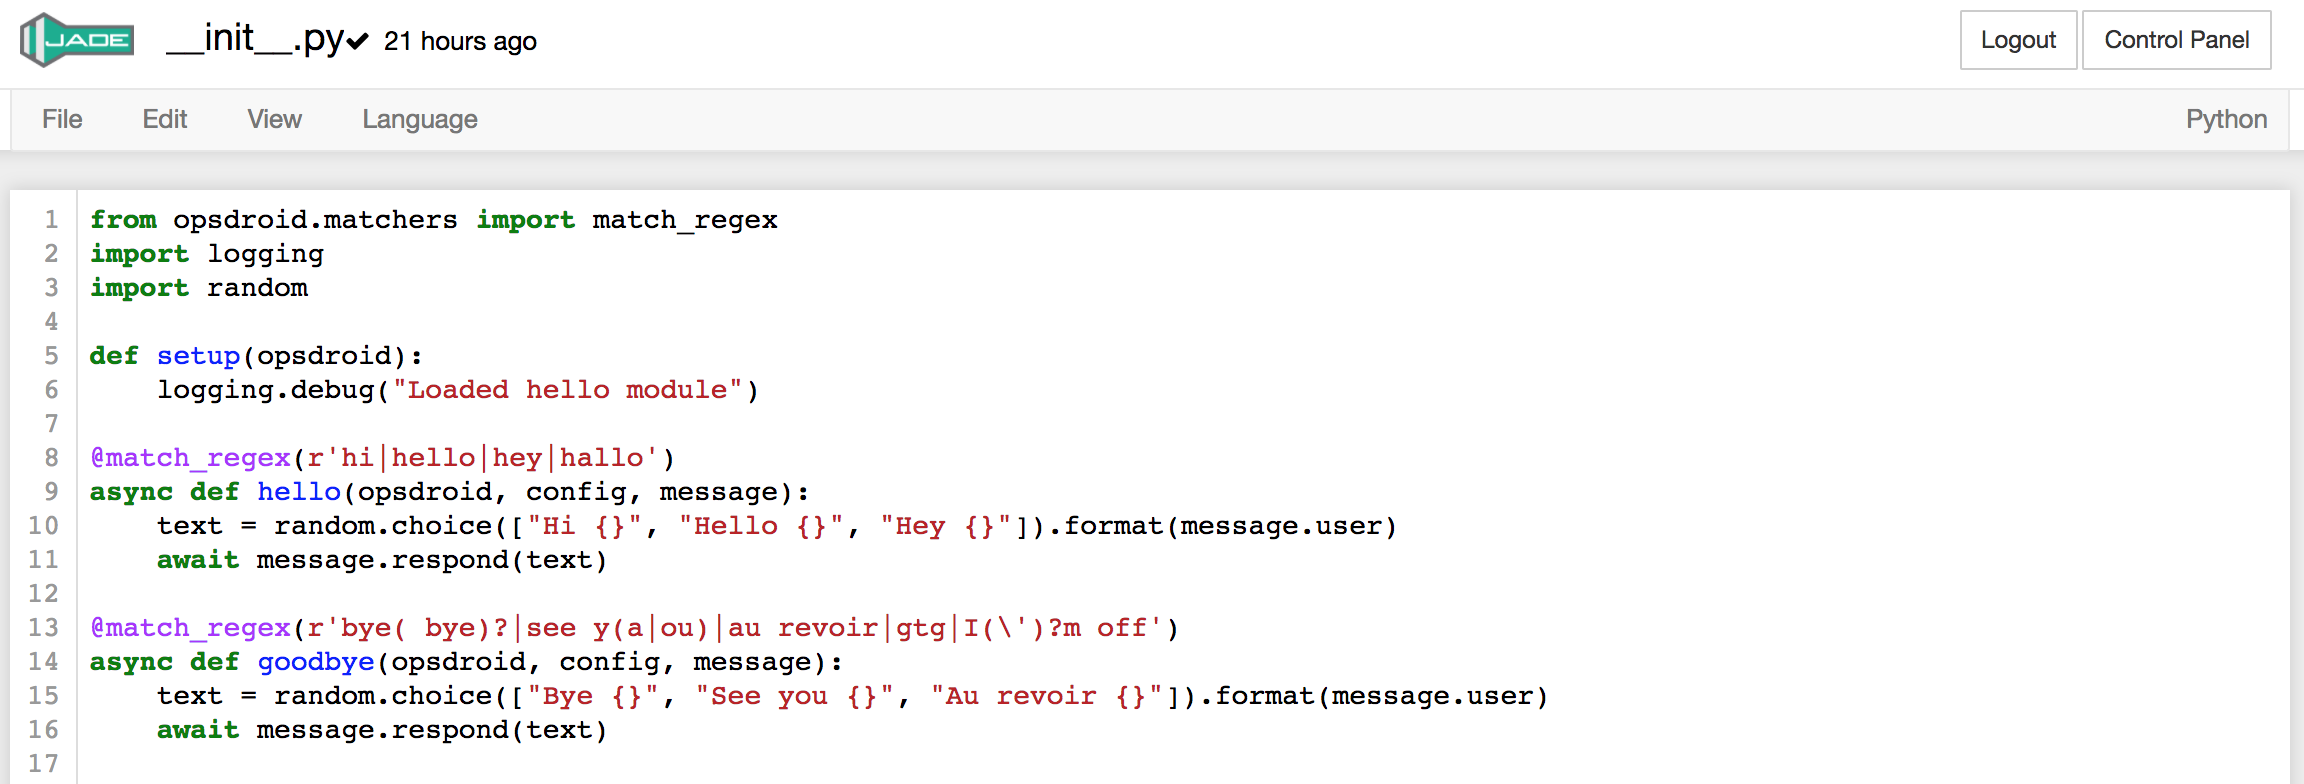 Example skill code